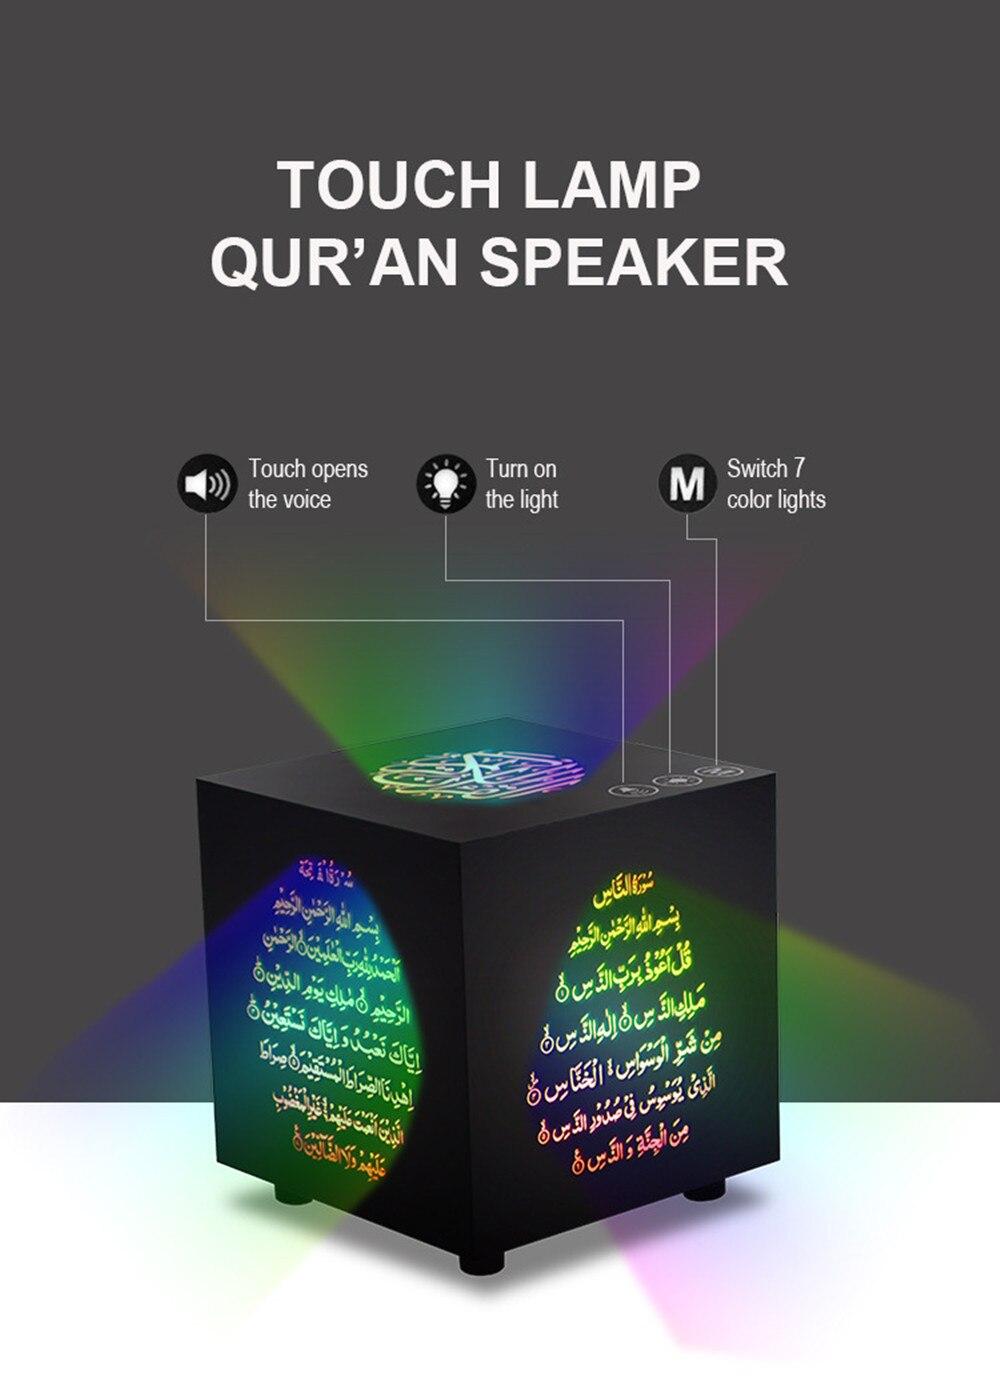 Quran Bluetooth Speaker Touch Colorful LED Light Wireless Table Lamp FM TF Audio Music Muslim Islamic Koran Speaker 25 Languages (17)